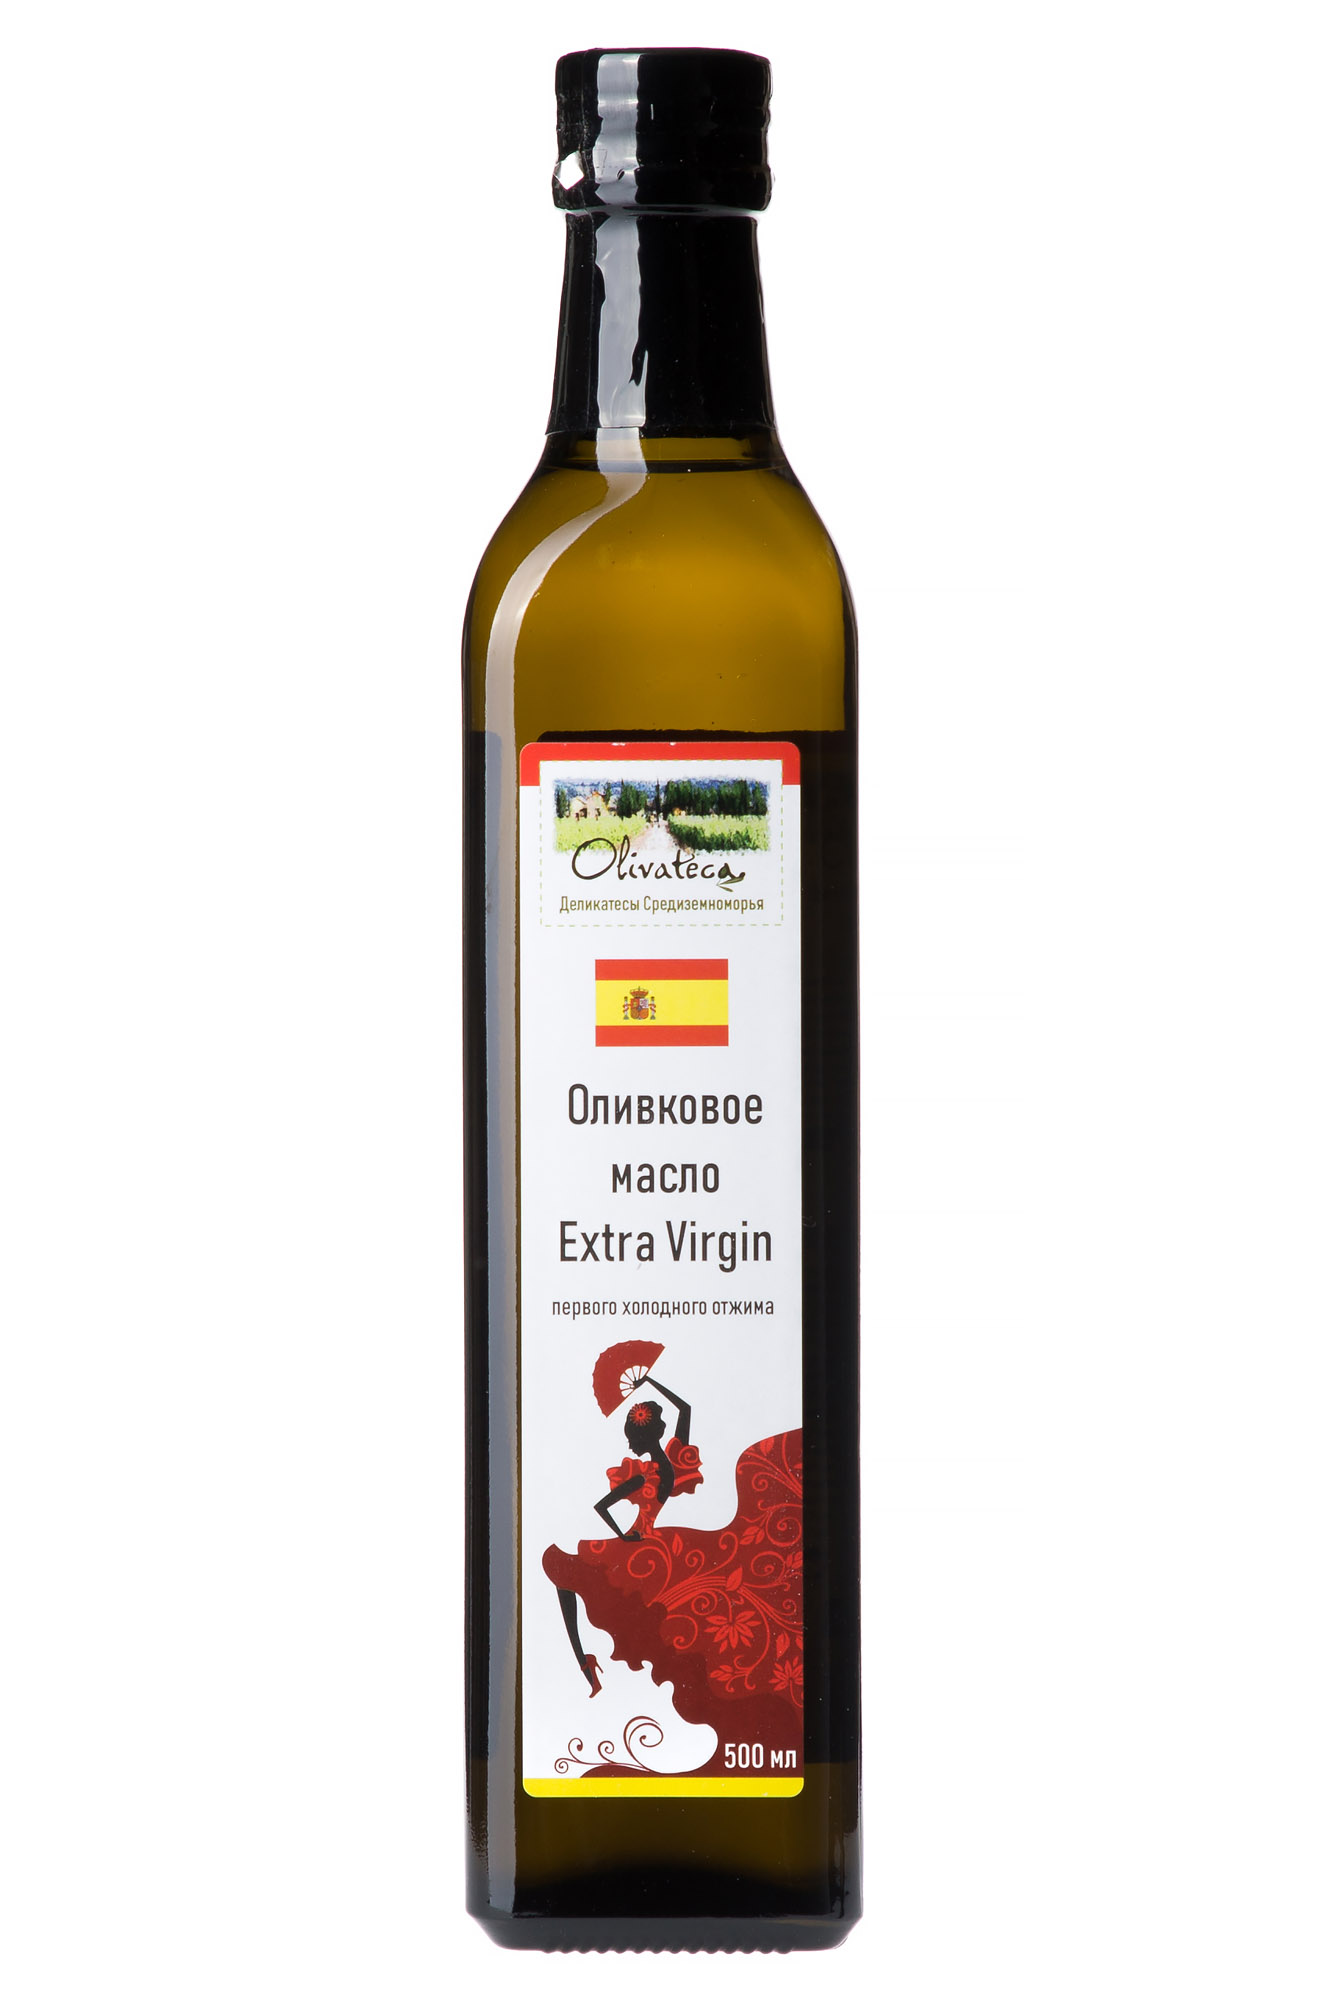 Оливковое масло OLIVATECA Масло оливковое Extra Virgin 500 мл just greece premium extra virgin оливковое масло 500 мл